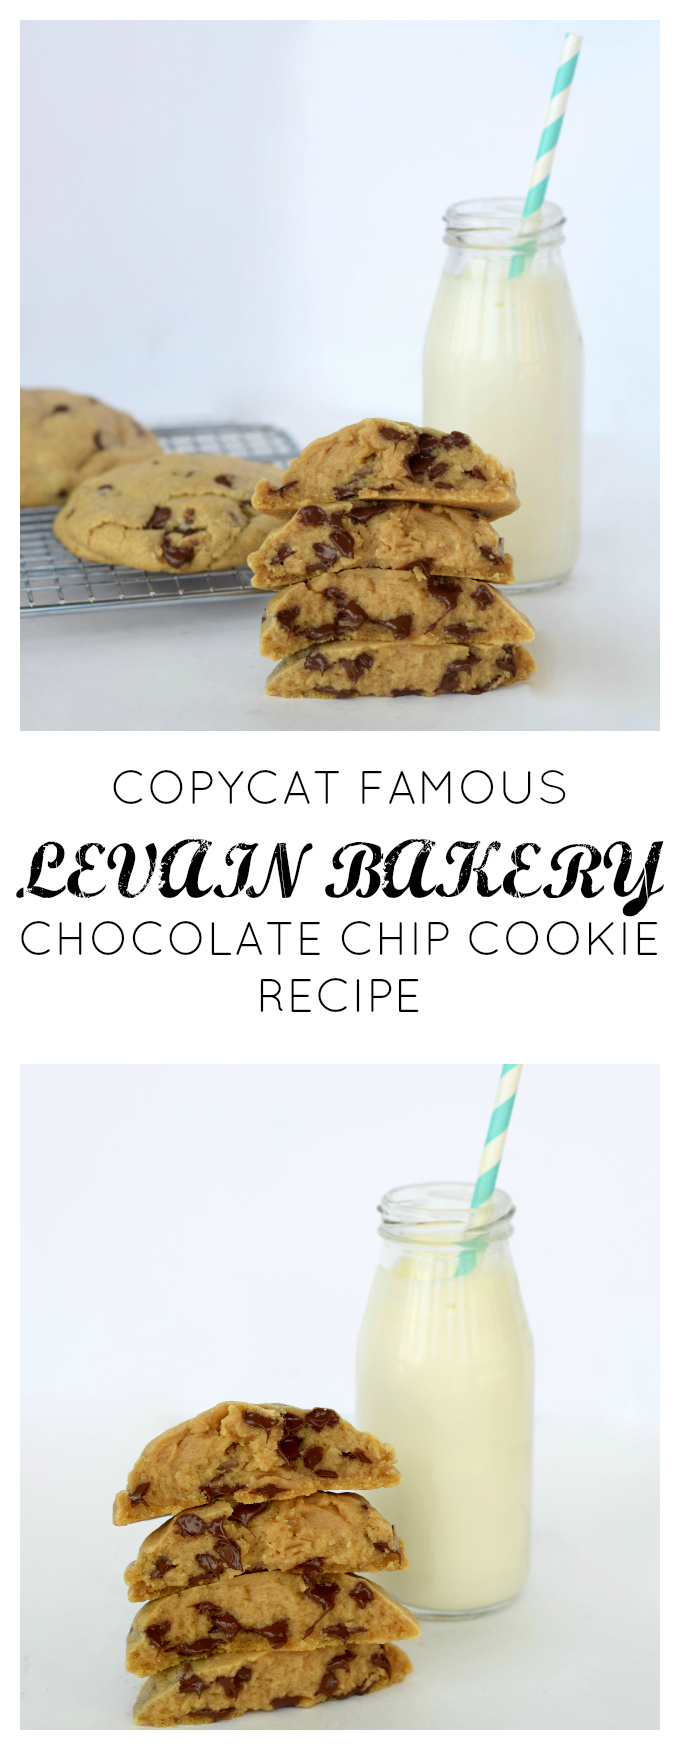 Copycat Famous Levain Bakery Chocolate Chip Cookie Recipe